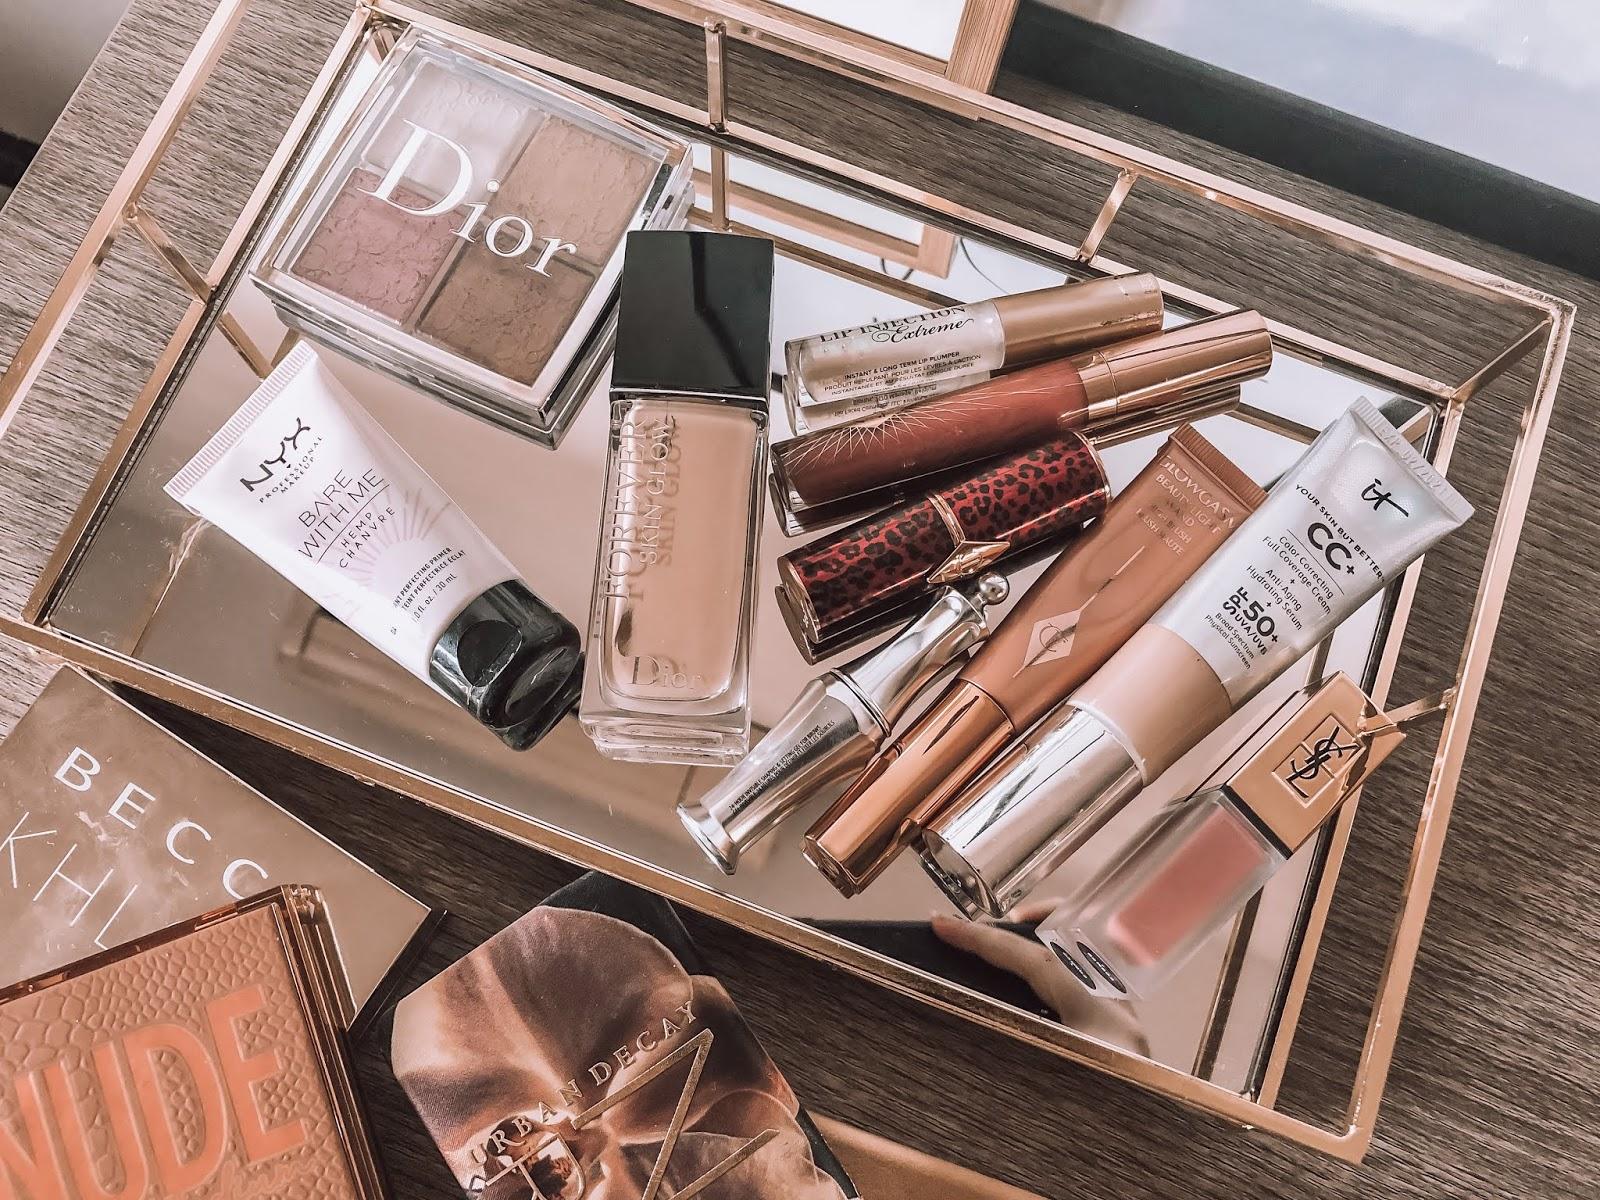 2019 beauty favorites, charlotte tilbury, dior, it cosmetics, abh, becca, huda,nyx